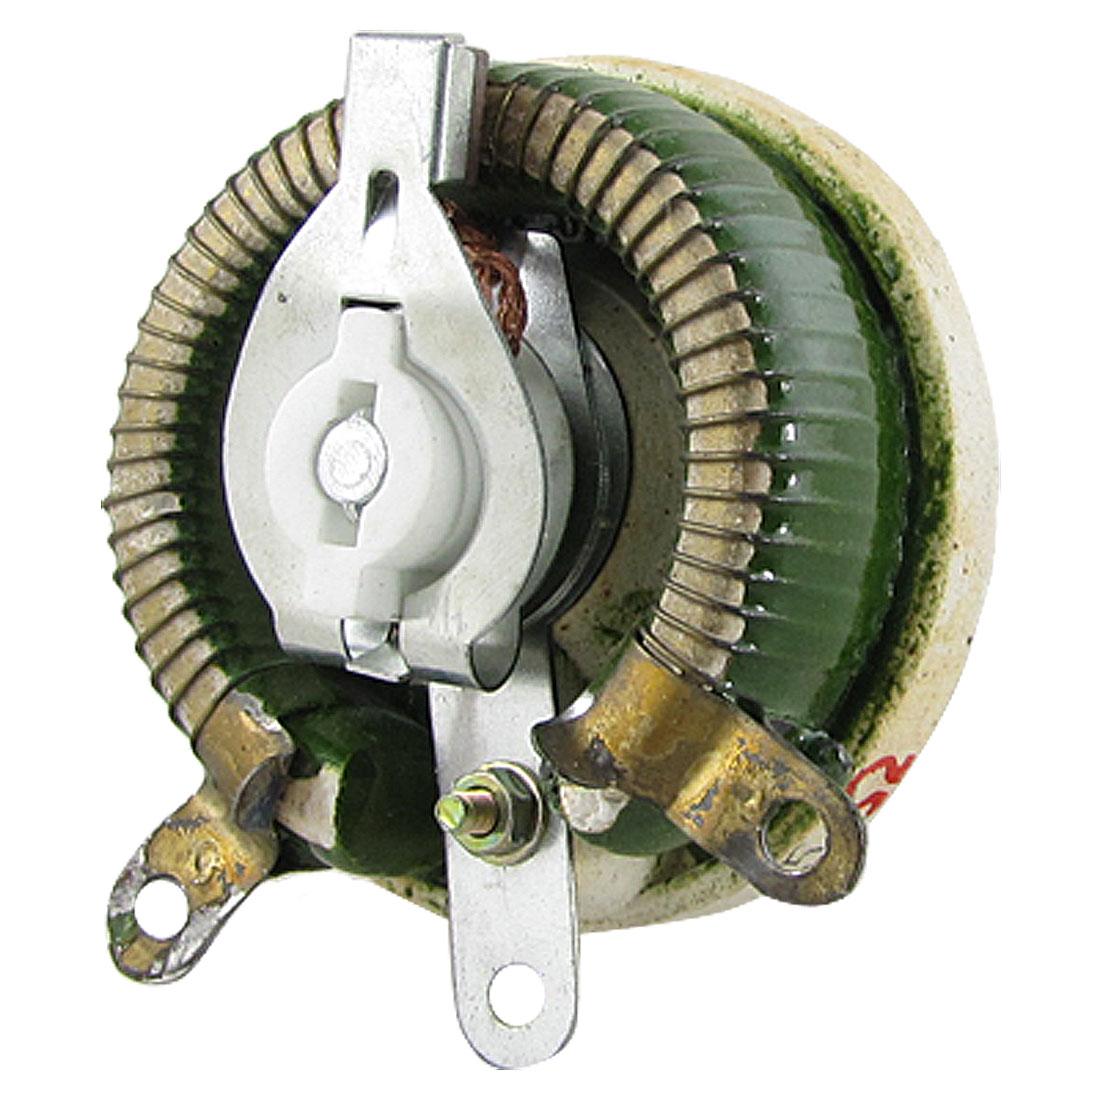 Ceramic Disk Wirewound Variable Resistor Rheostat 5 Ohm 50W